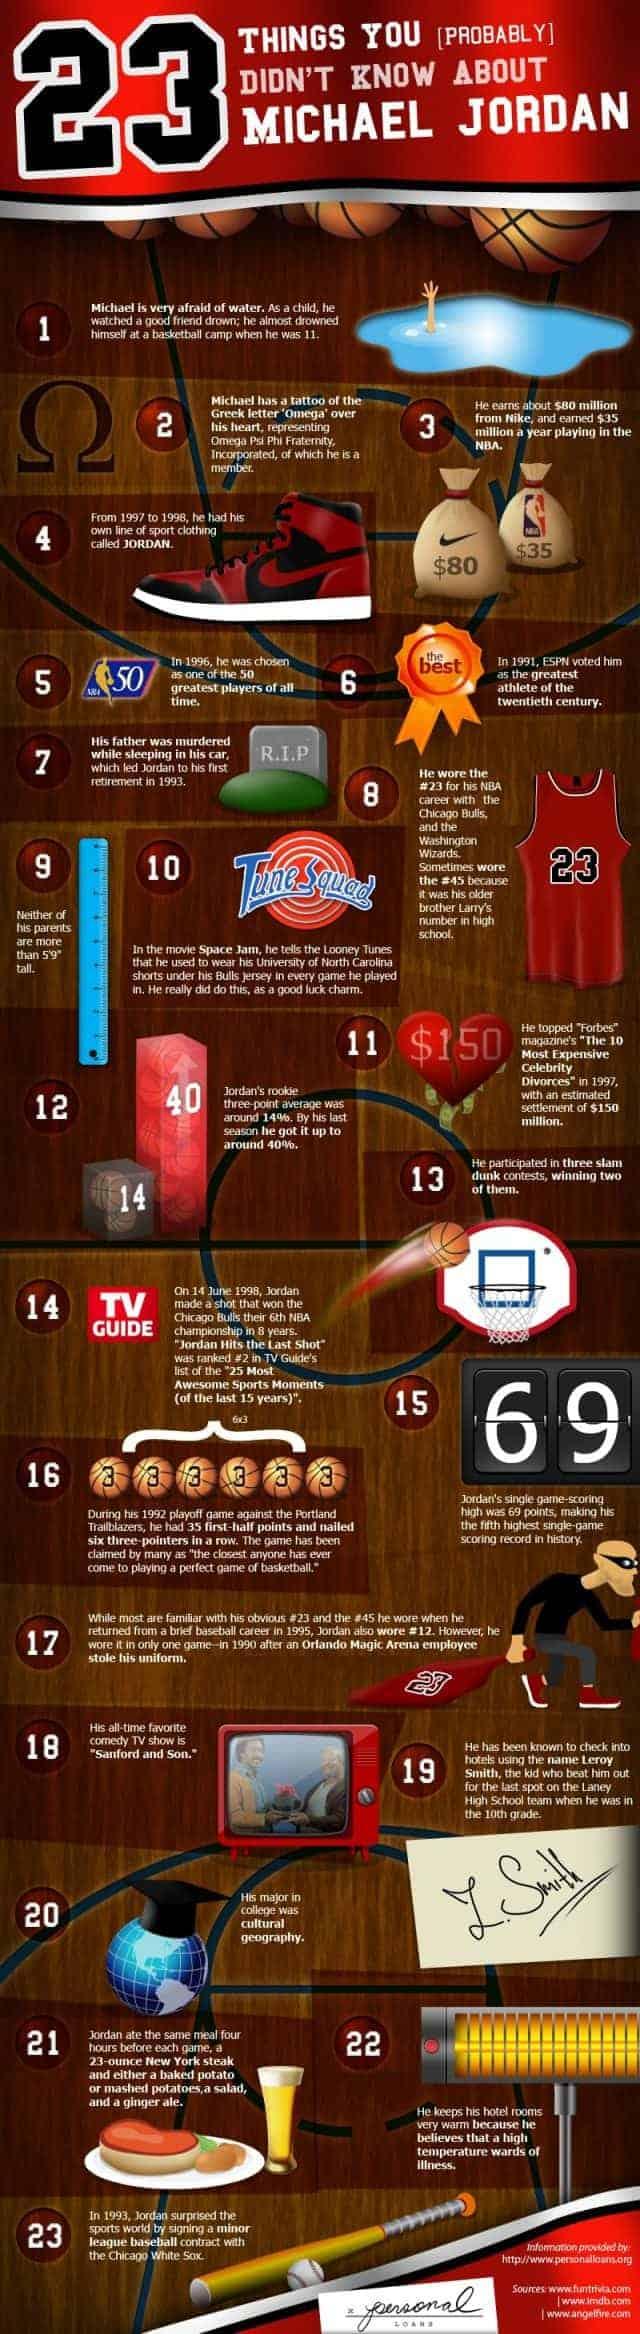 Secrets of Michael Jordan Infographic